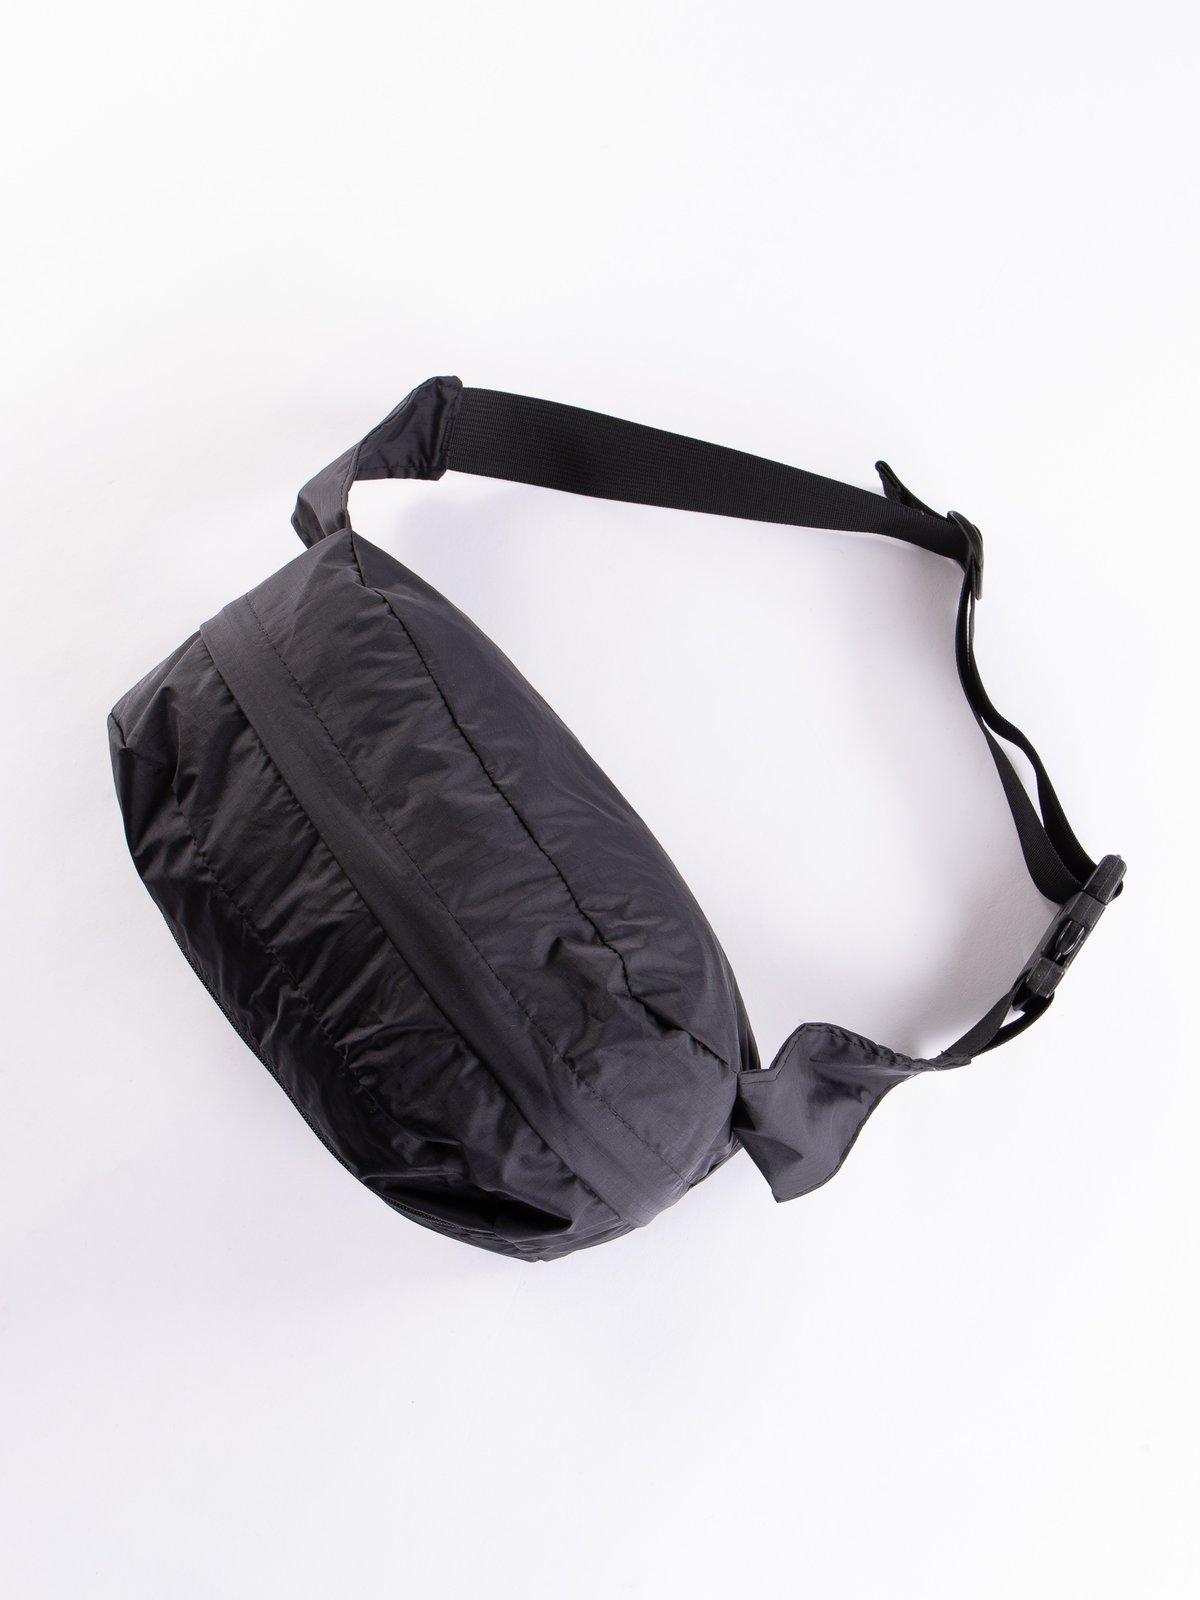 Black Nylon Ripstop UL Waistpack - Image 3